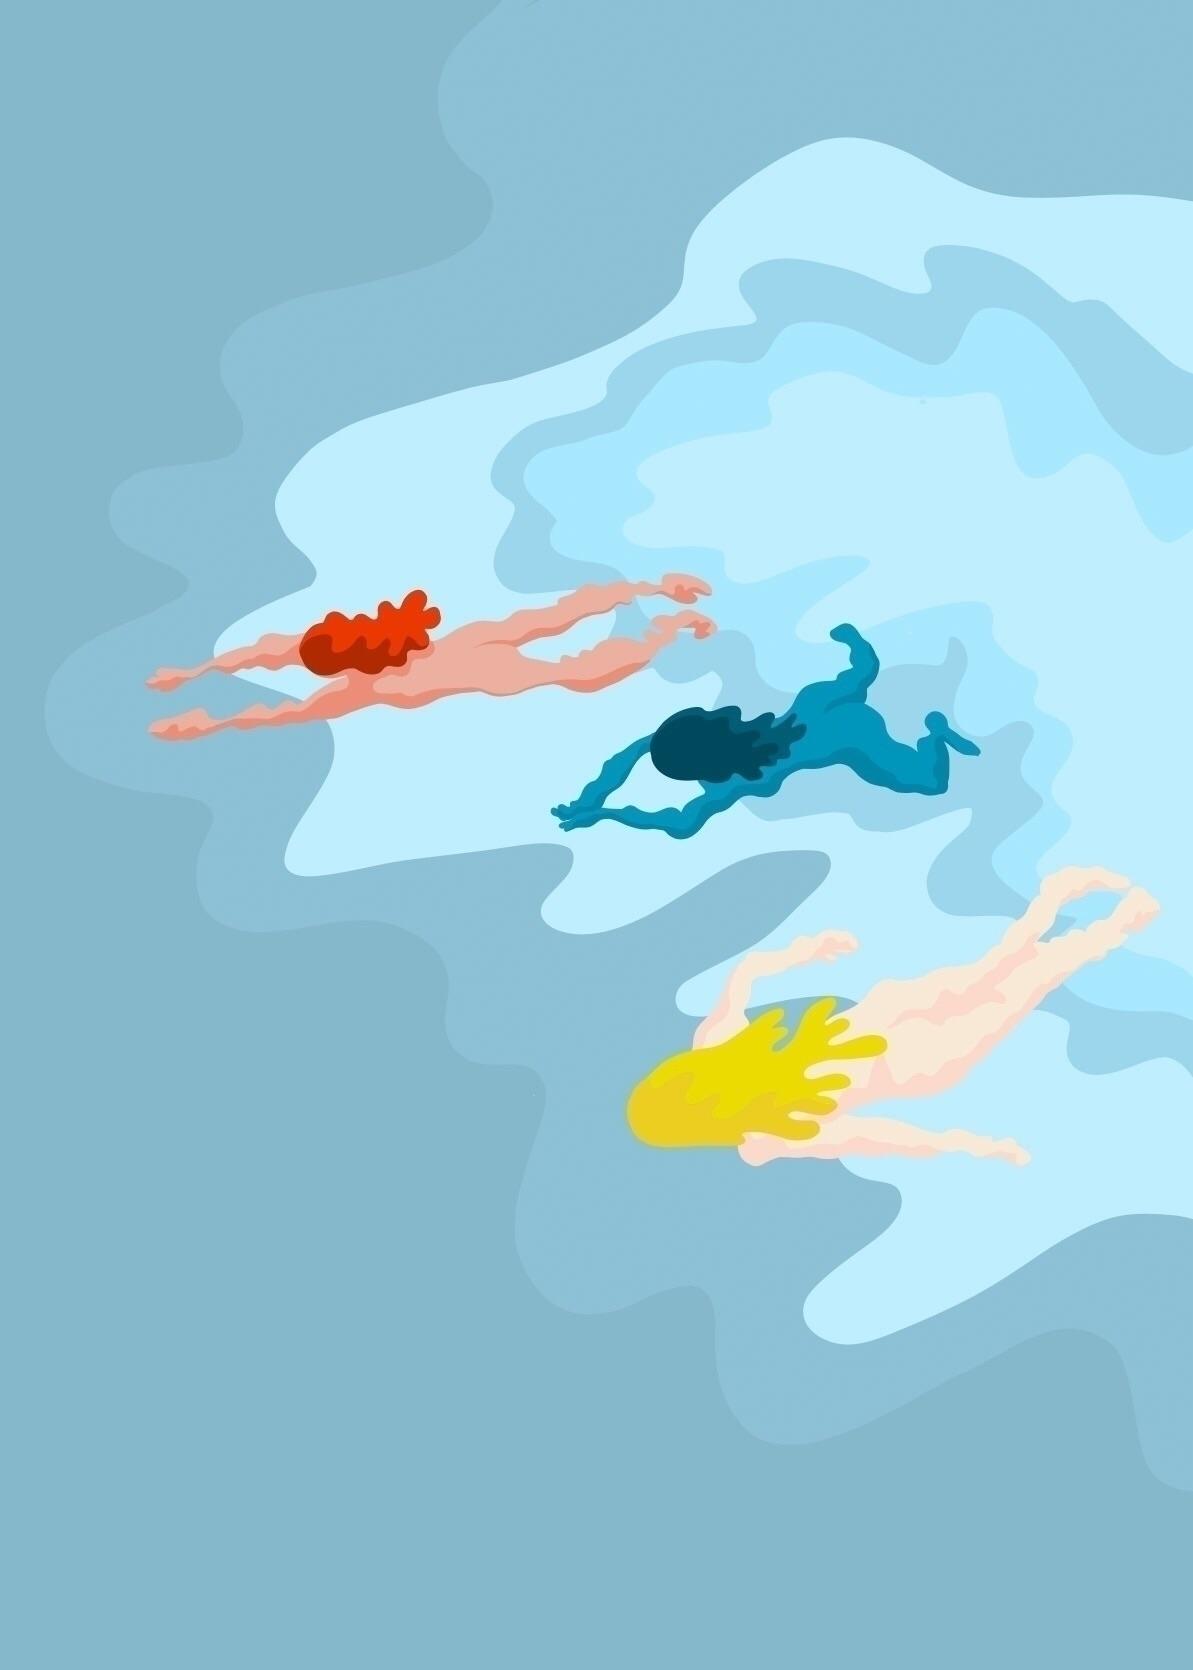 Summer Swim - cooldown, itistoohot - andreaforgacs   ello